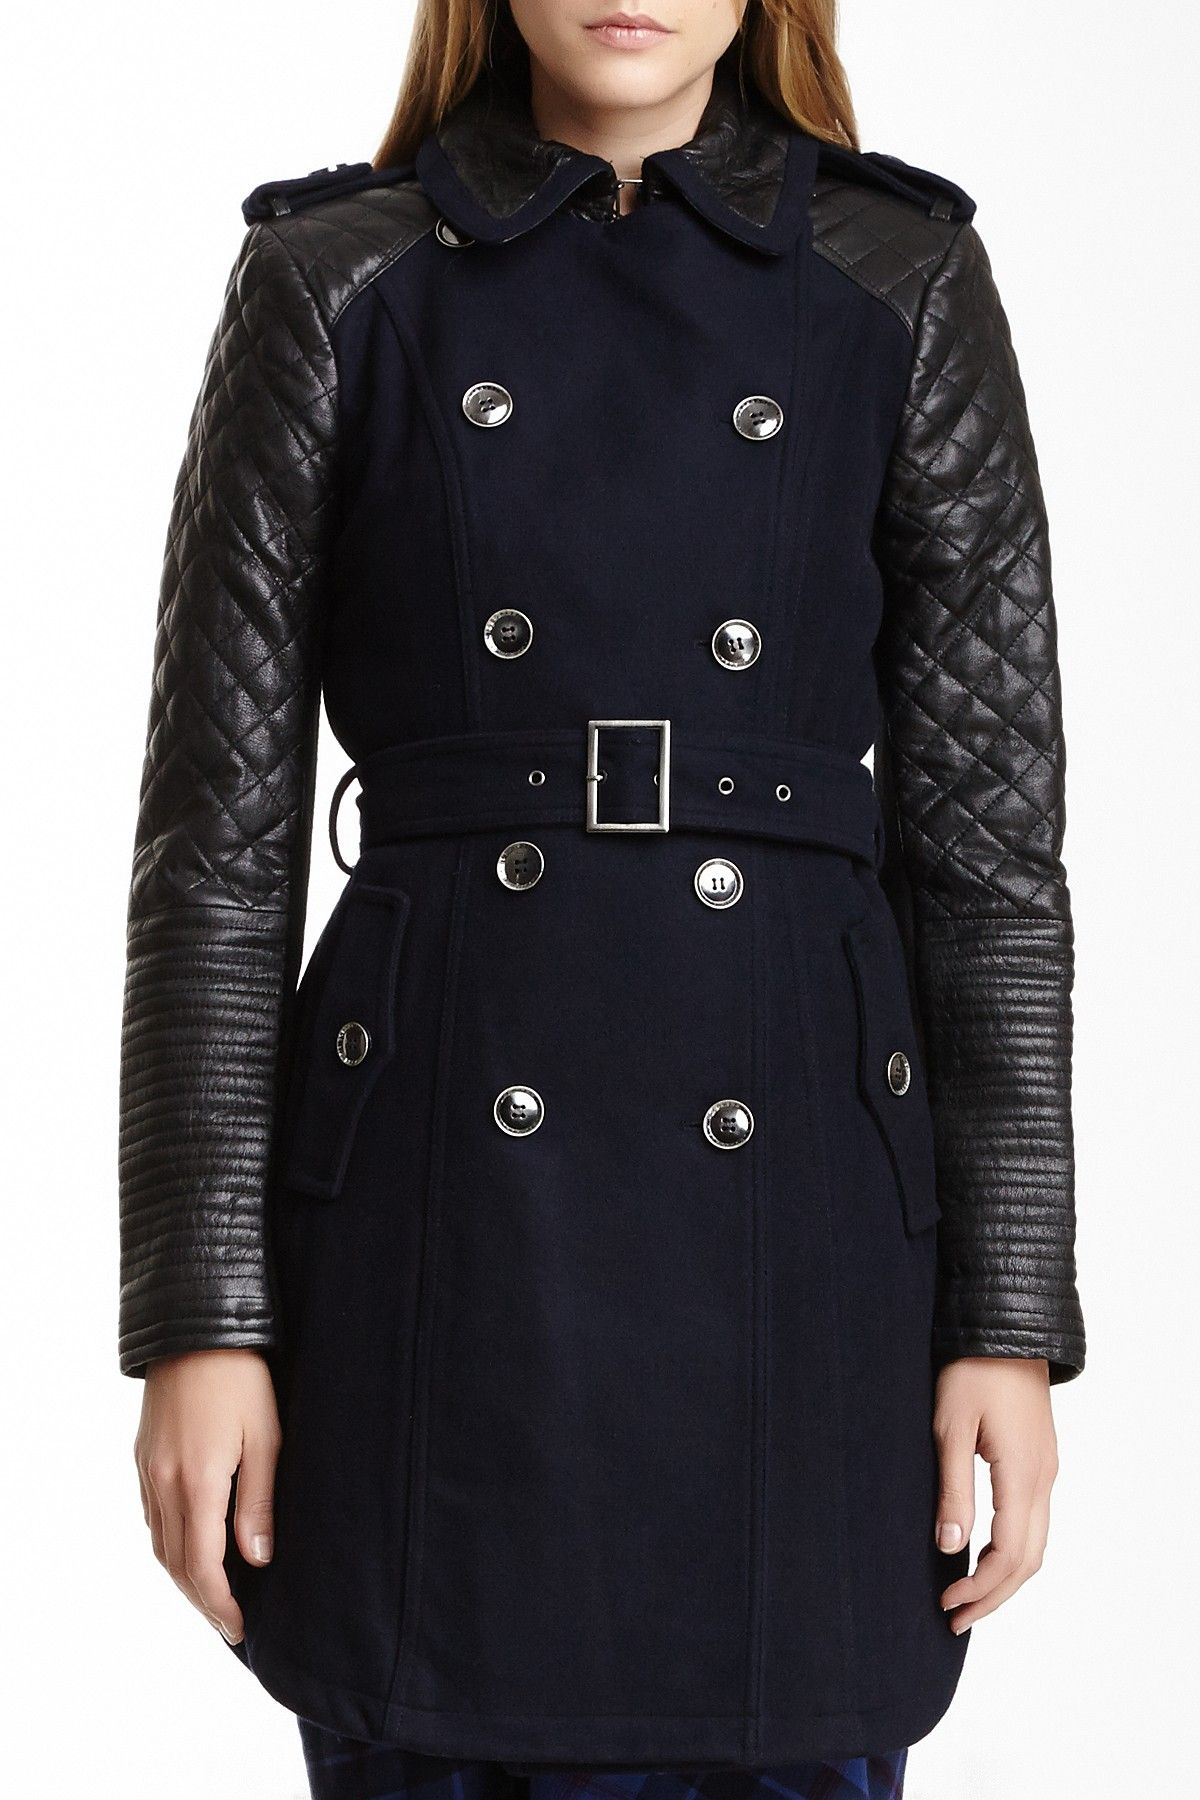 BCBG wool trench coat <3